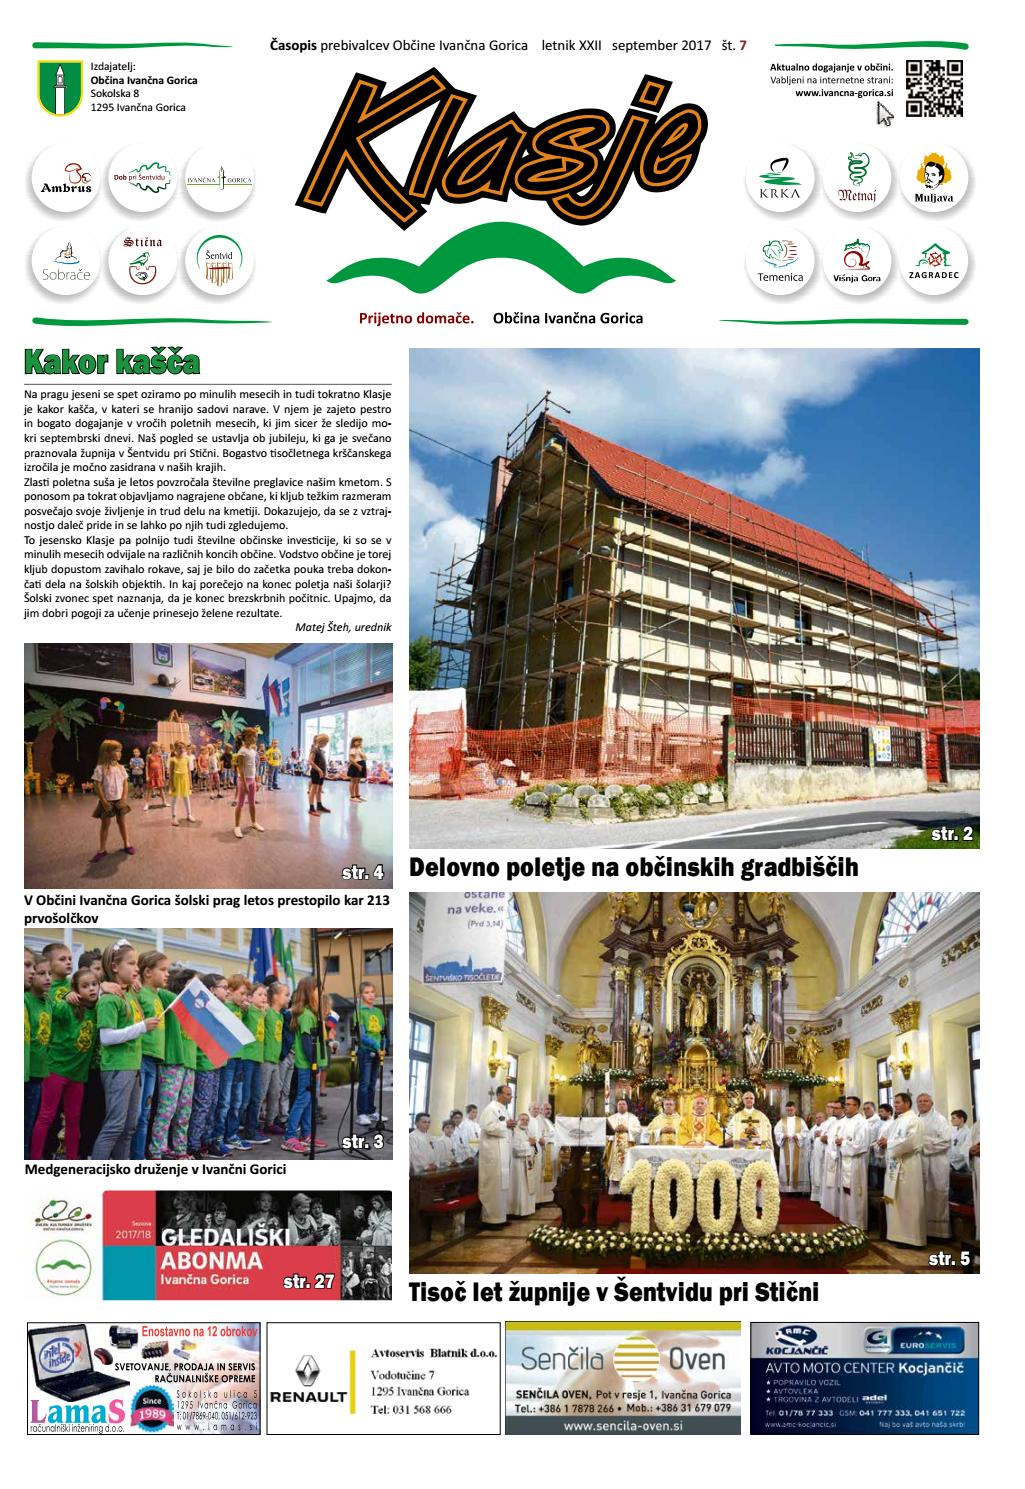 Klasje september 2017 by Newsroom Slovenia - issuu